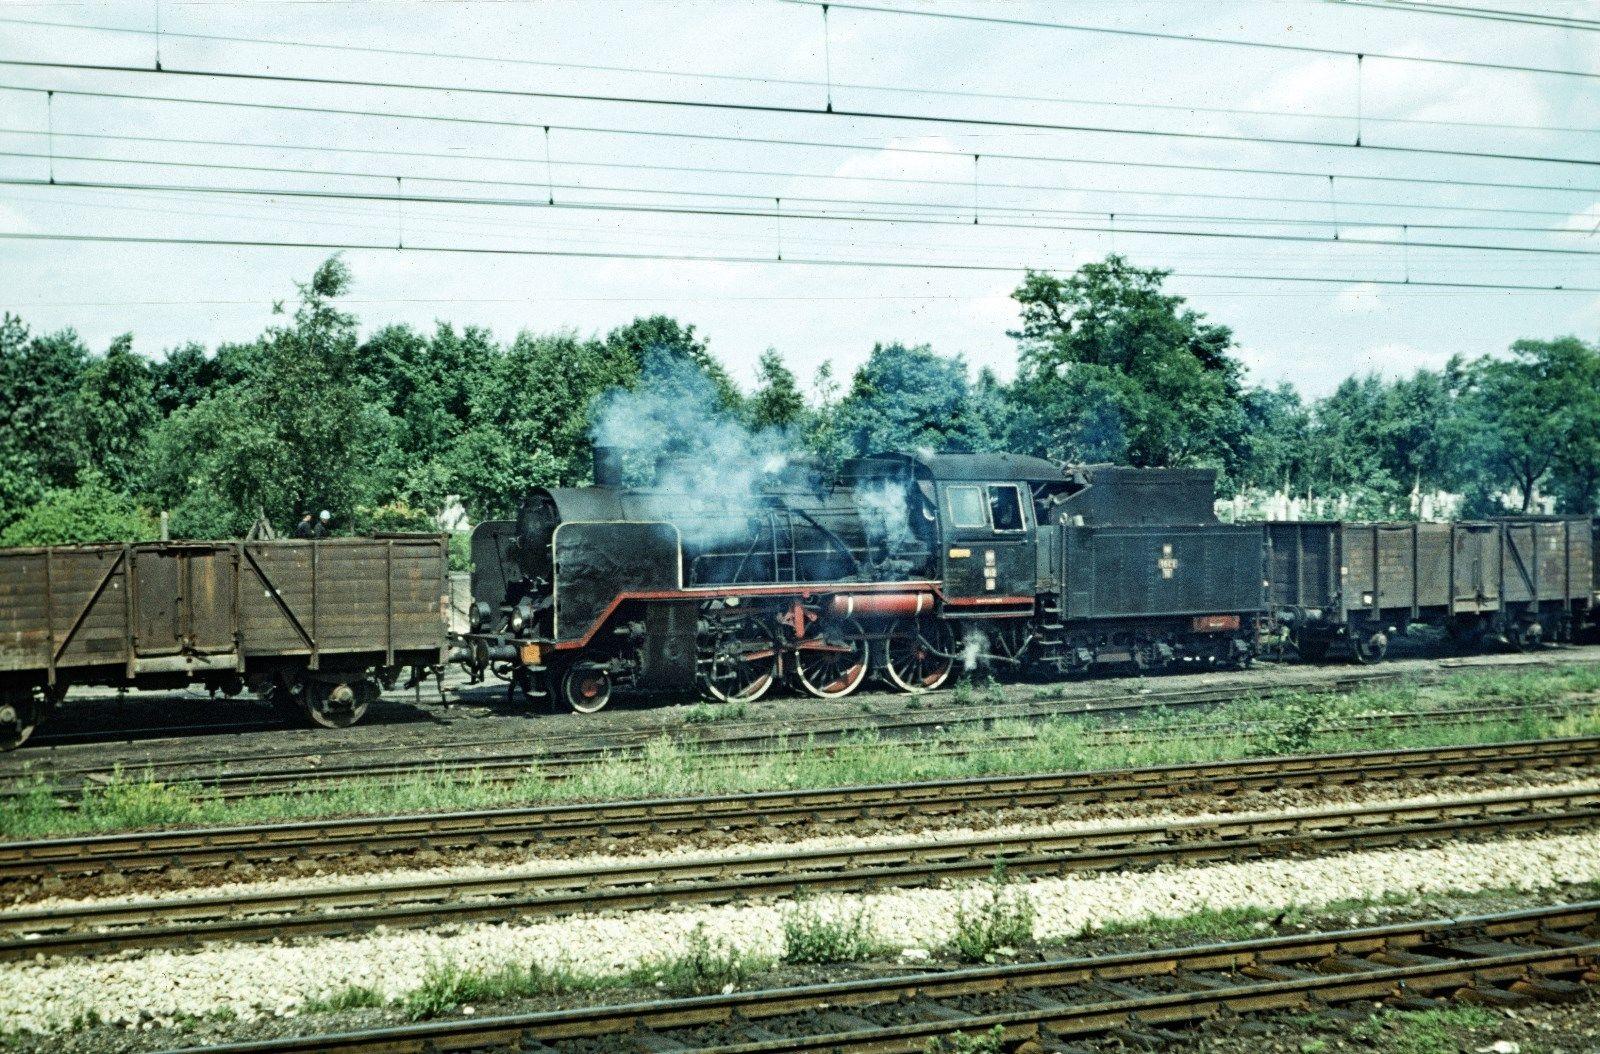 Oi 2-18 (24 008) Bromberg Hbf 18.6.1972.jpg